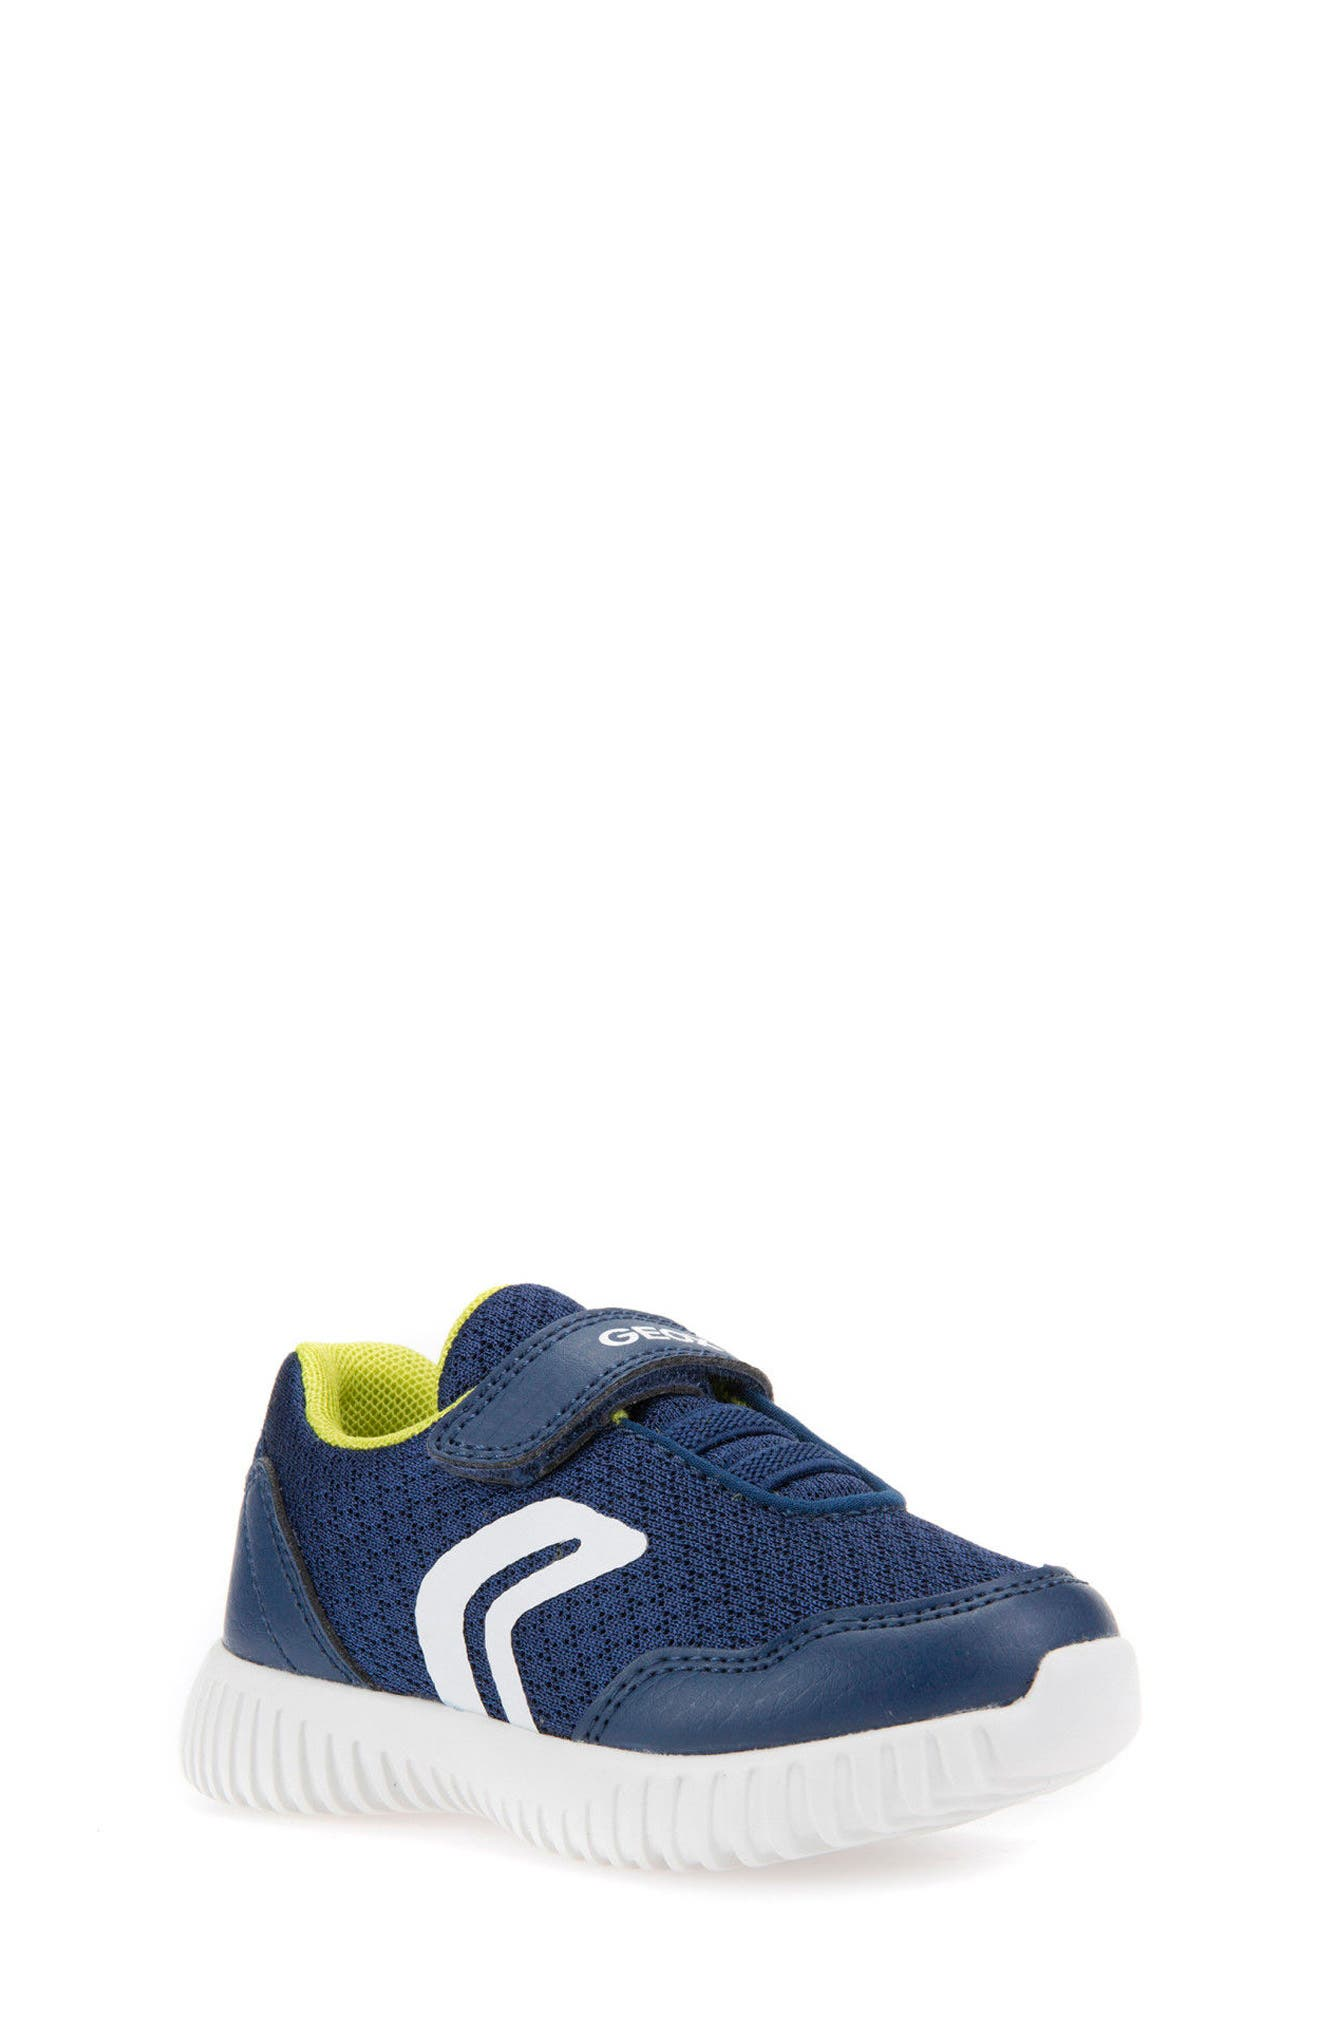 Alternate Image 1 Selected - Geox Waviness Sneaker (Walker & Toddler)